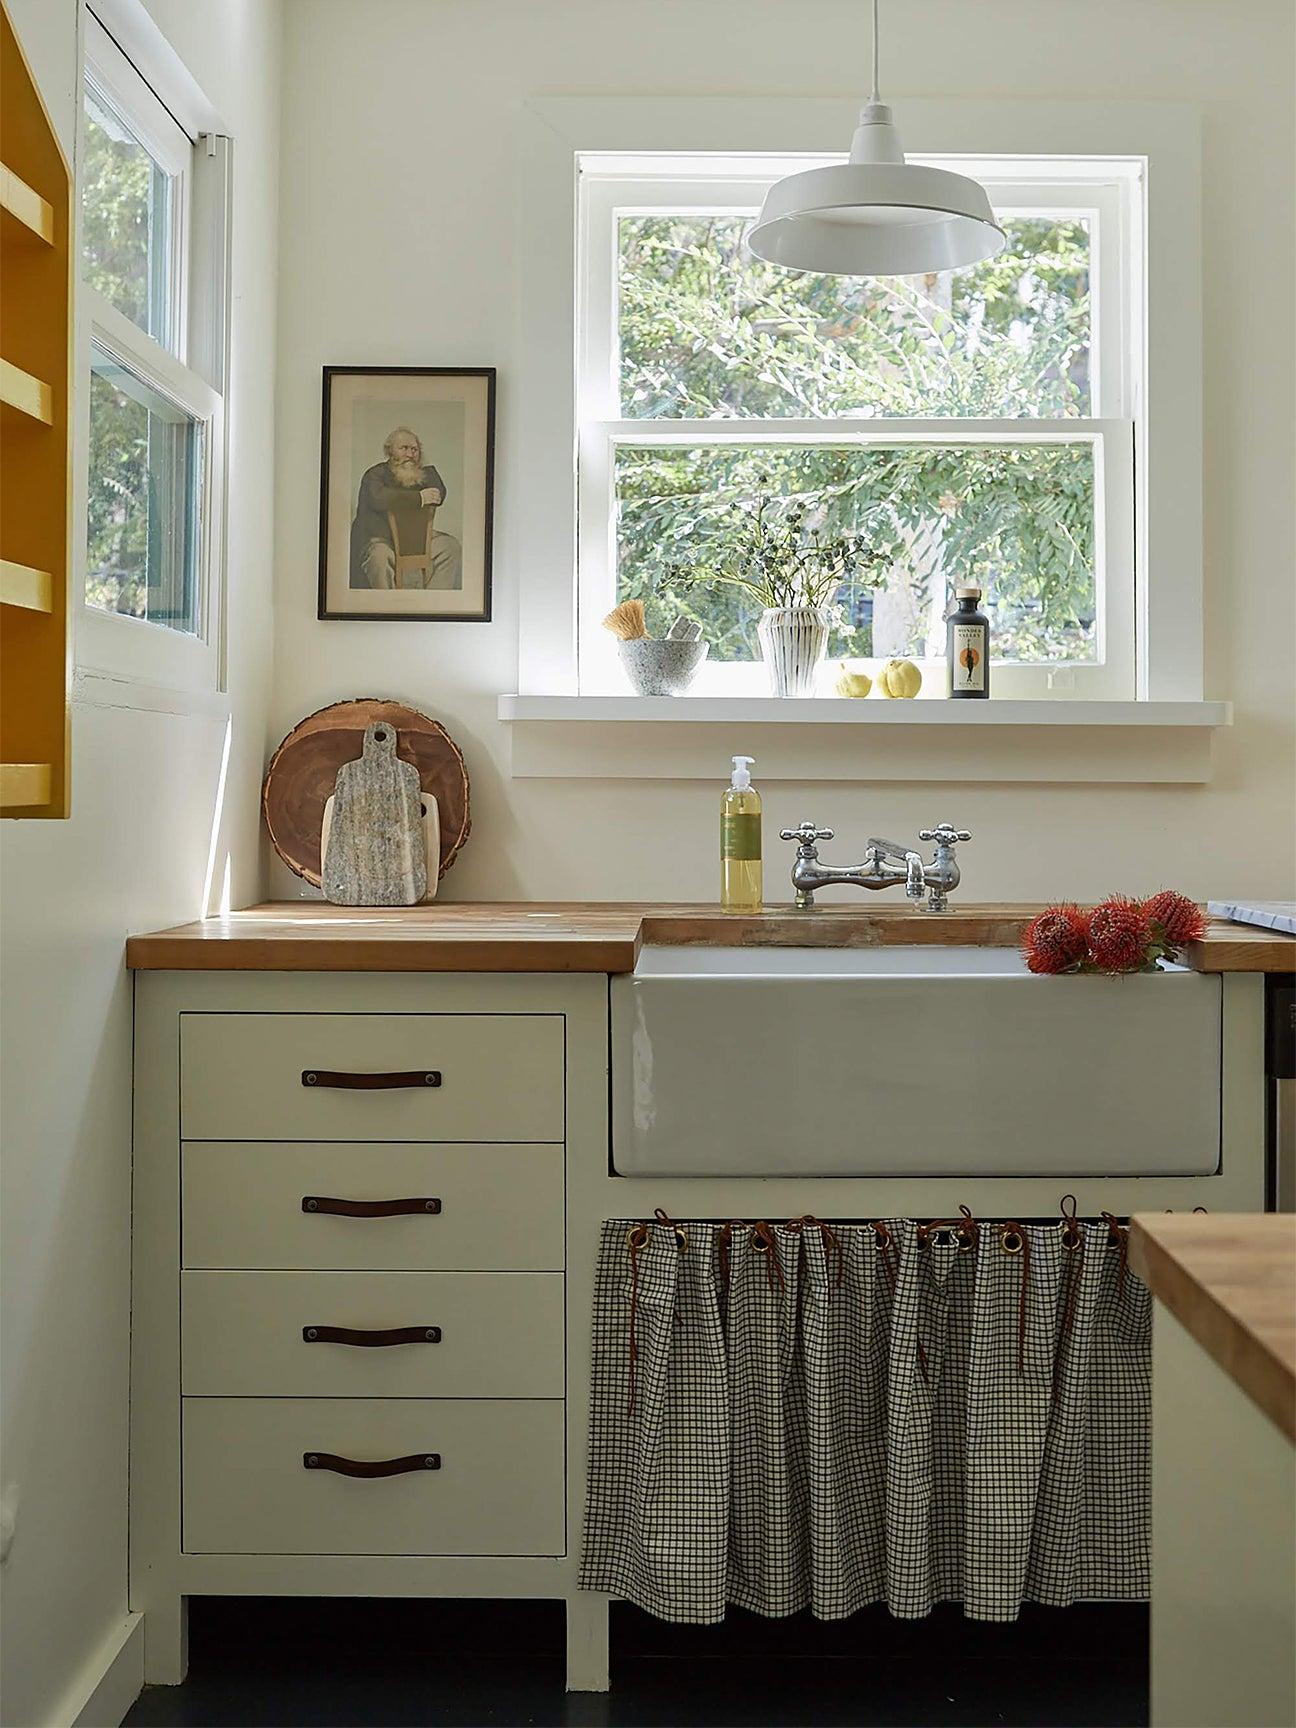 Farmhouse kitchen with sink skirt